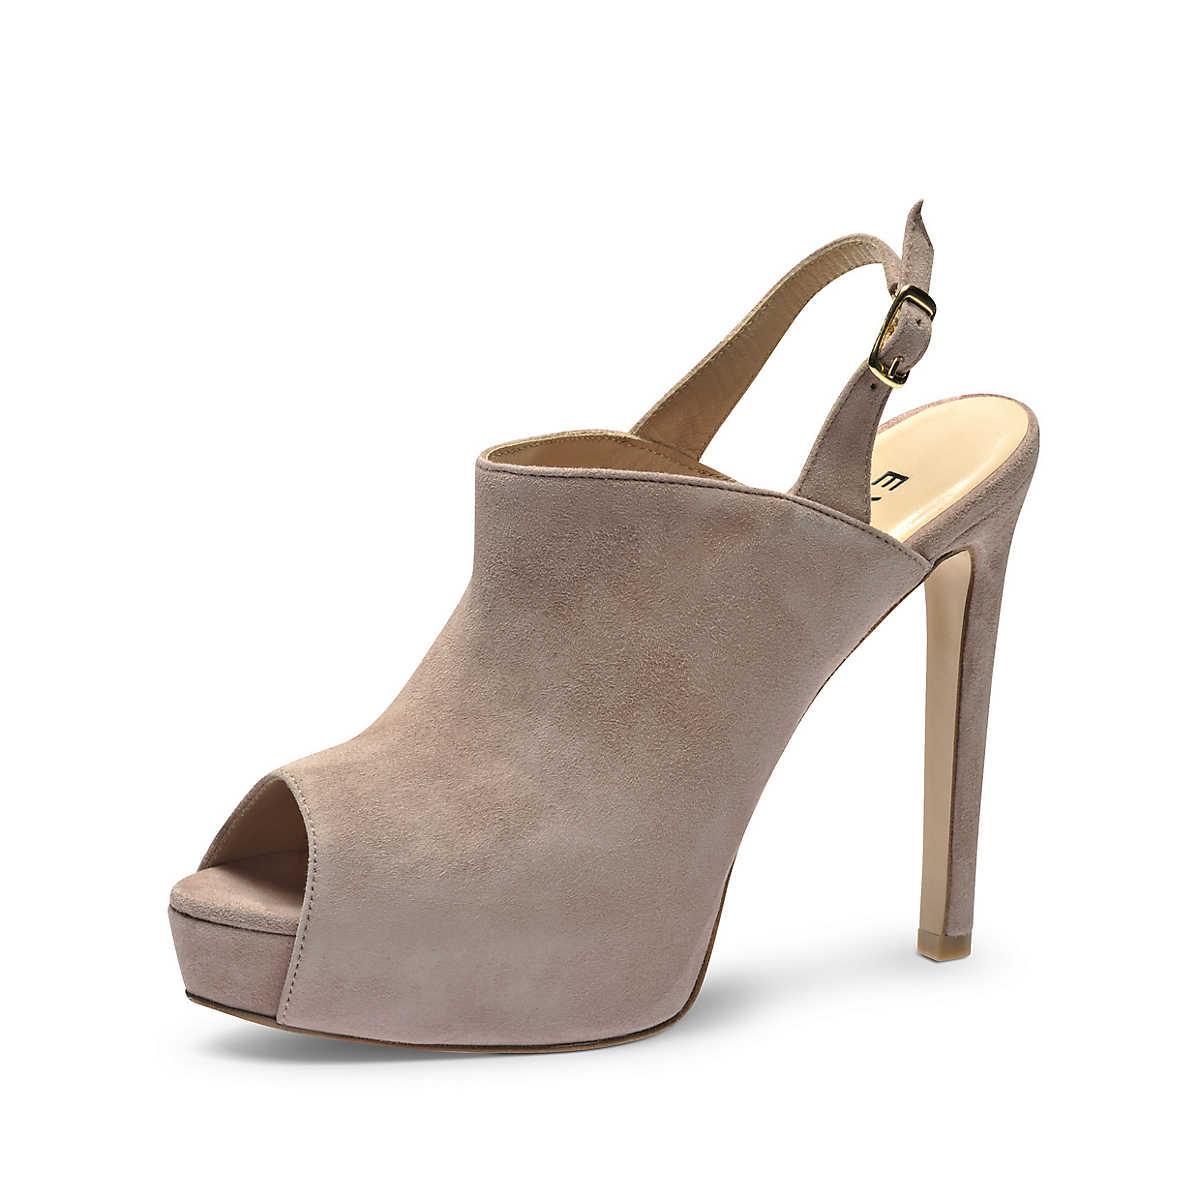 Evita Shoes Sandaletten altrosa - Evita Shoes - Pumps - Schuhe - mirapodo.de